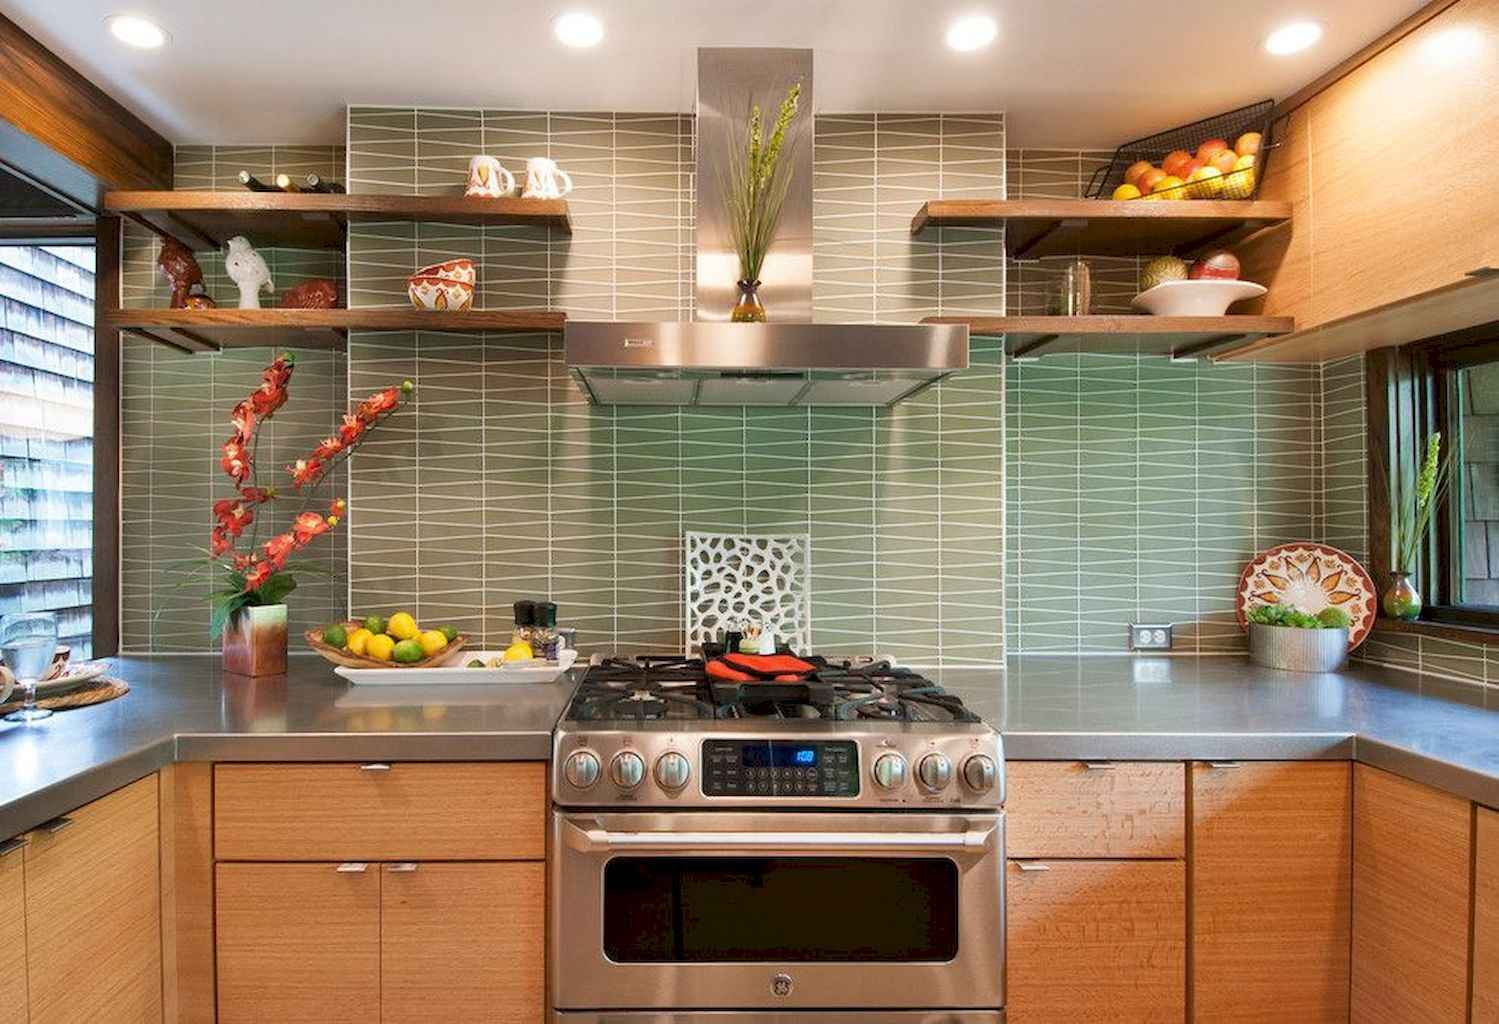 Mid century modern kitchen design ideas (22)